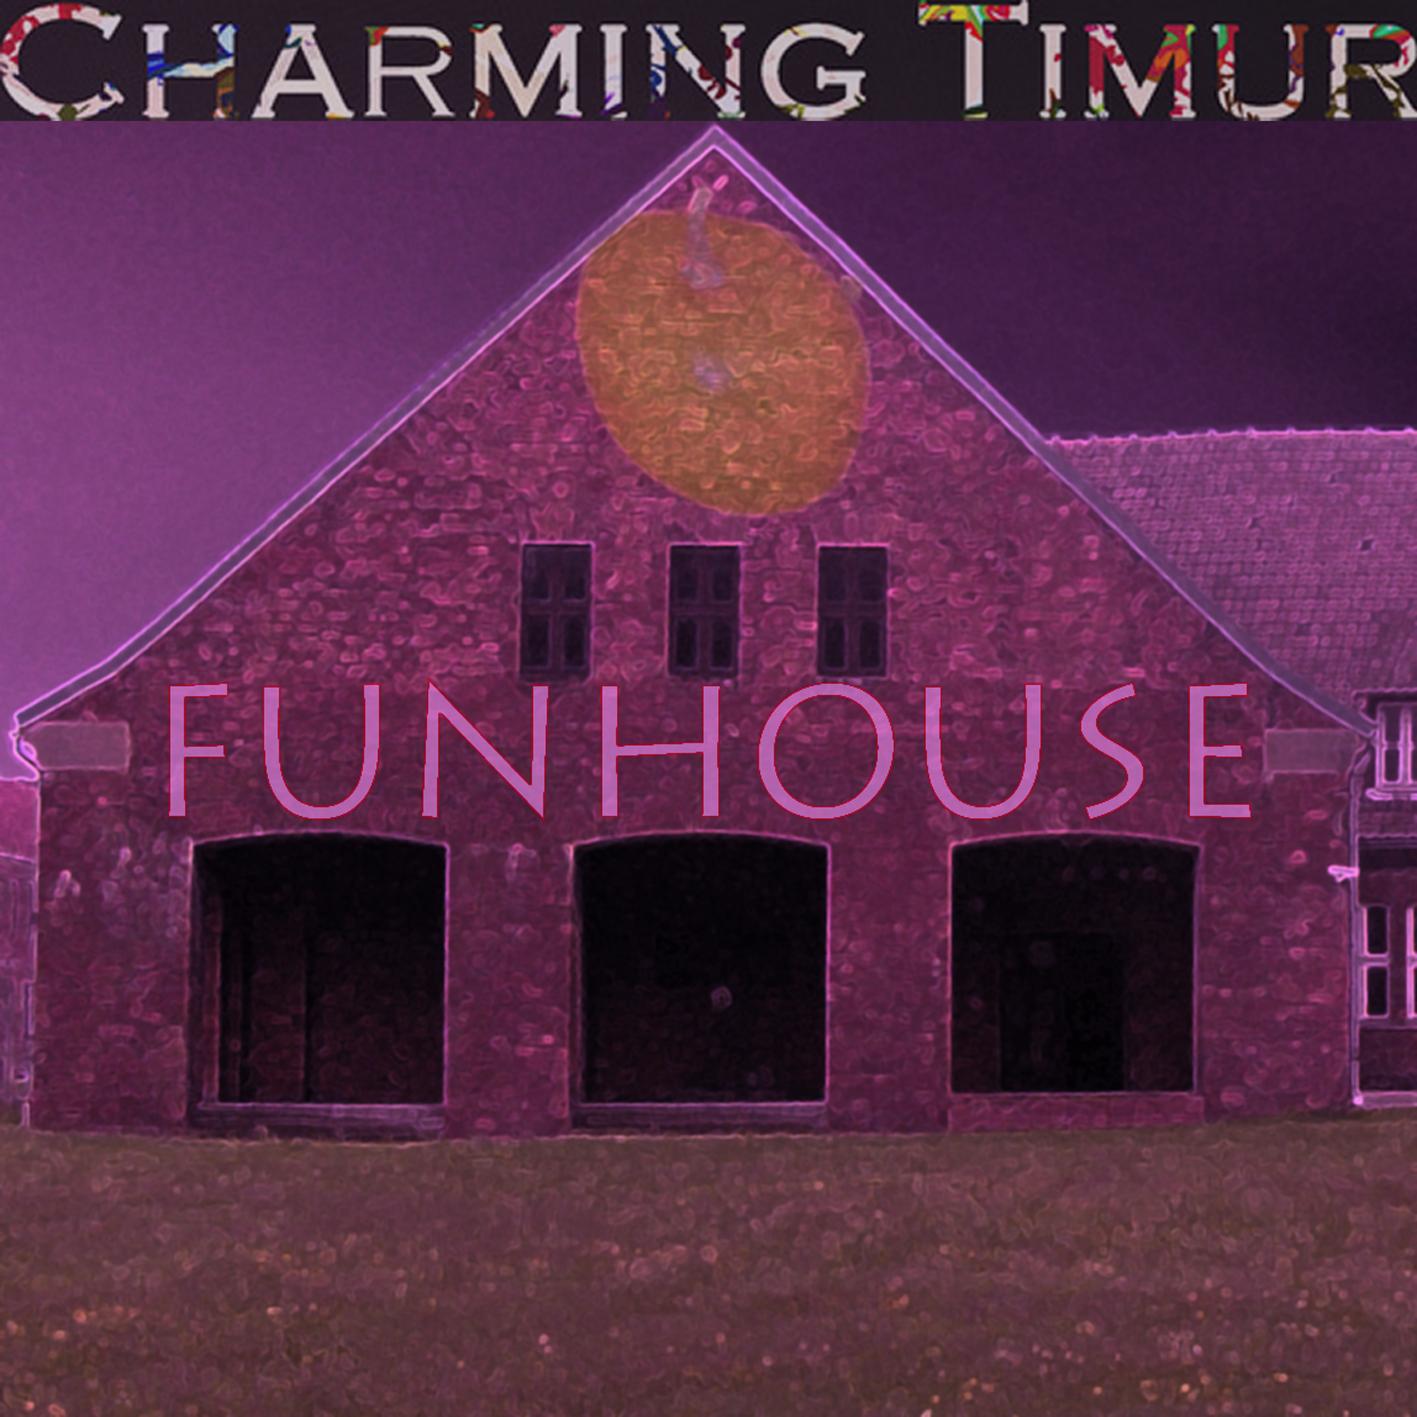 Charming Timur – Funhouse